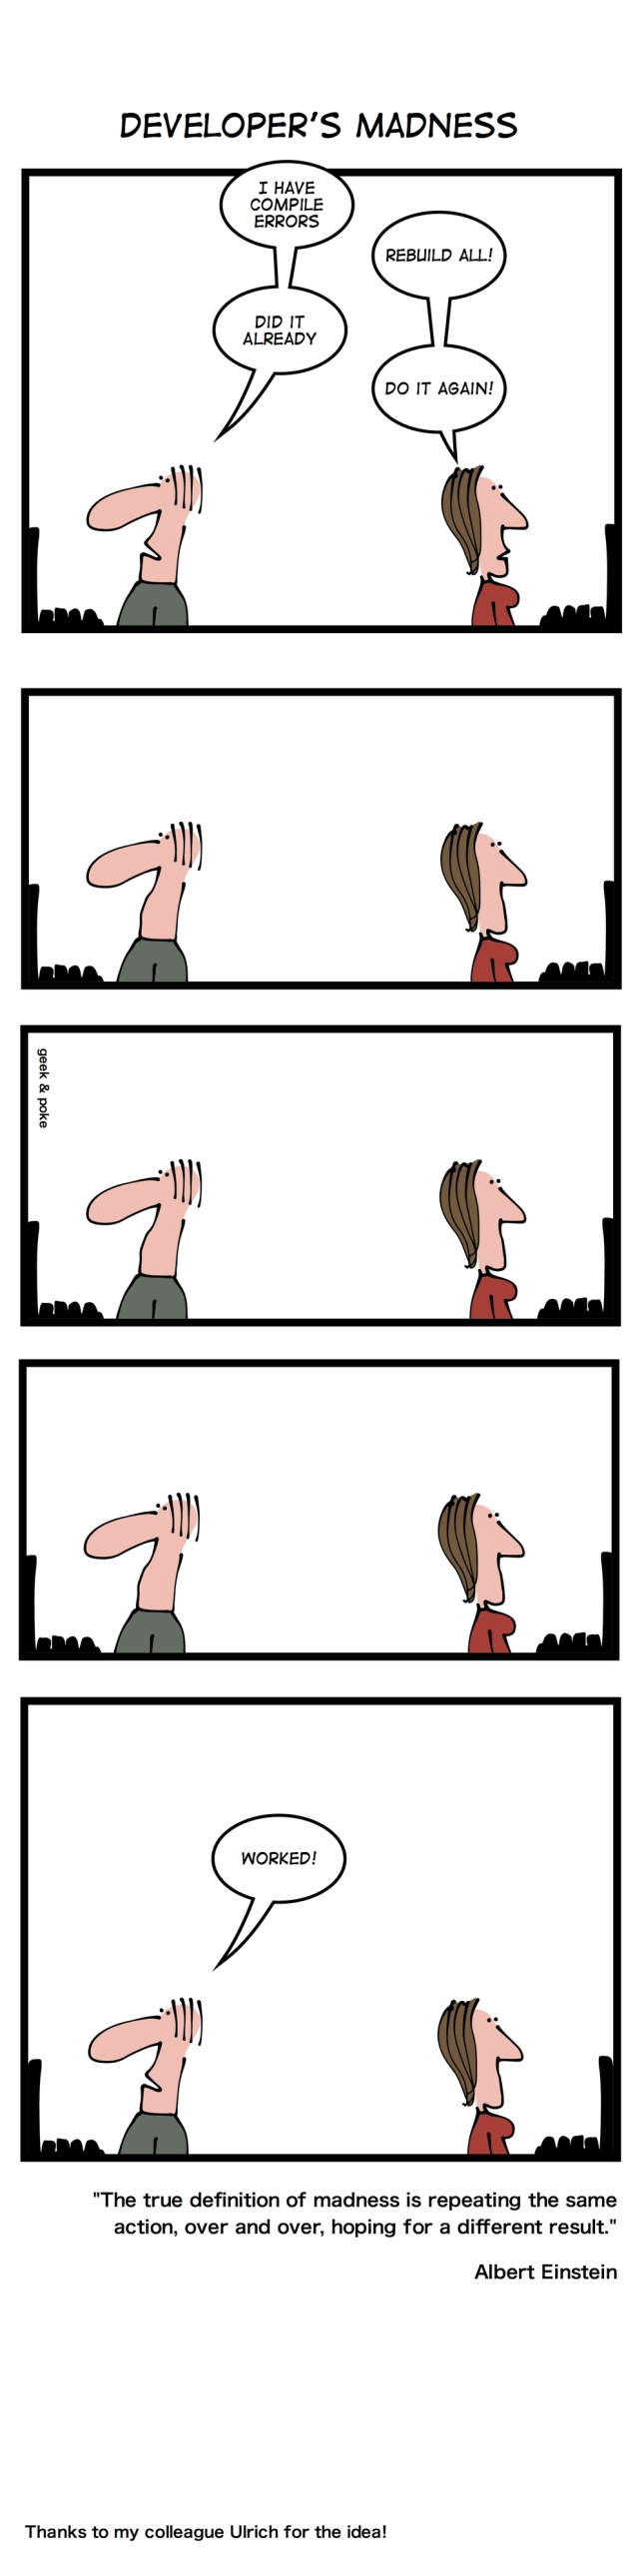 developer madness